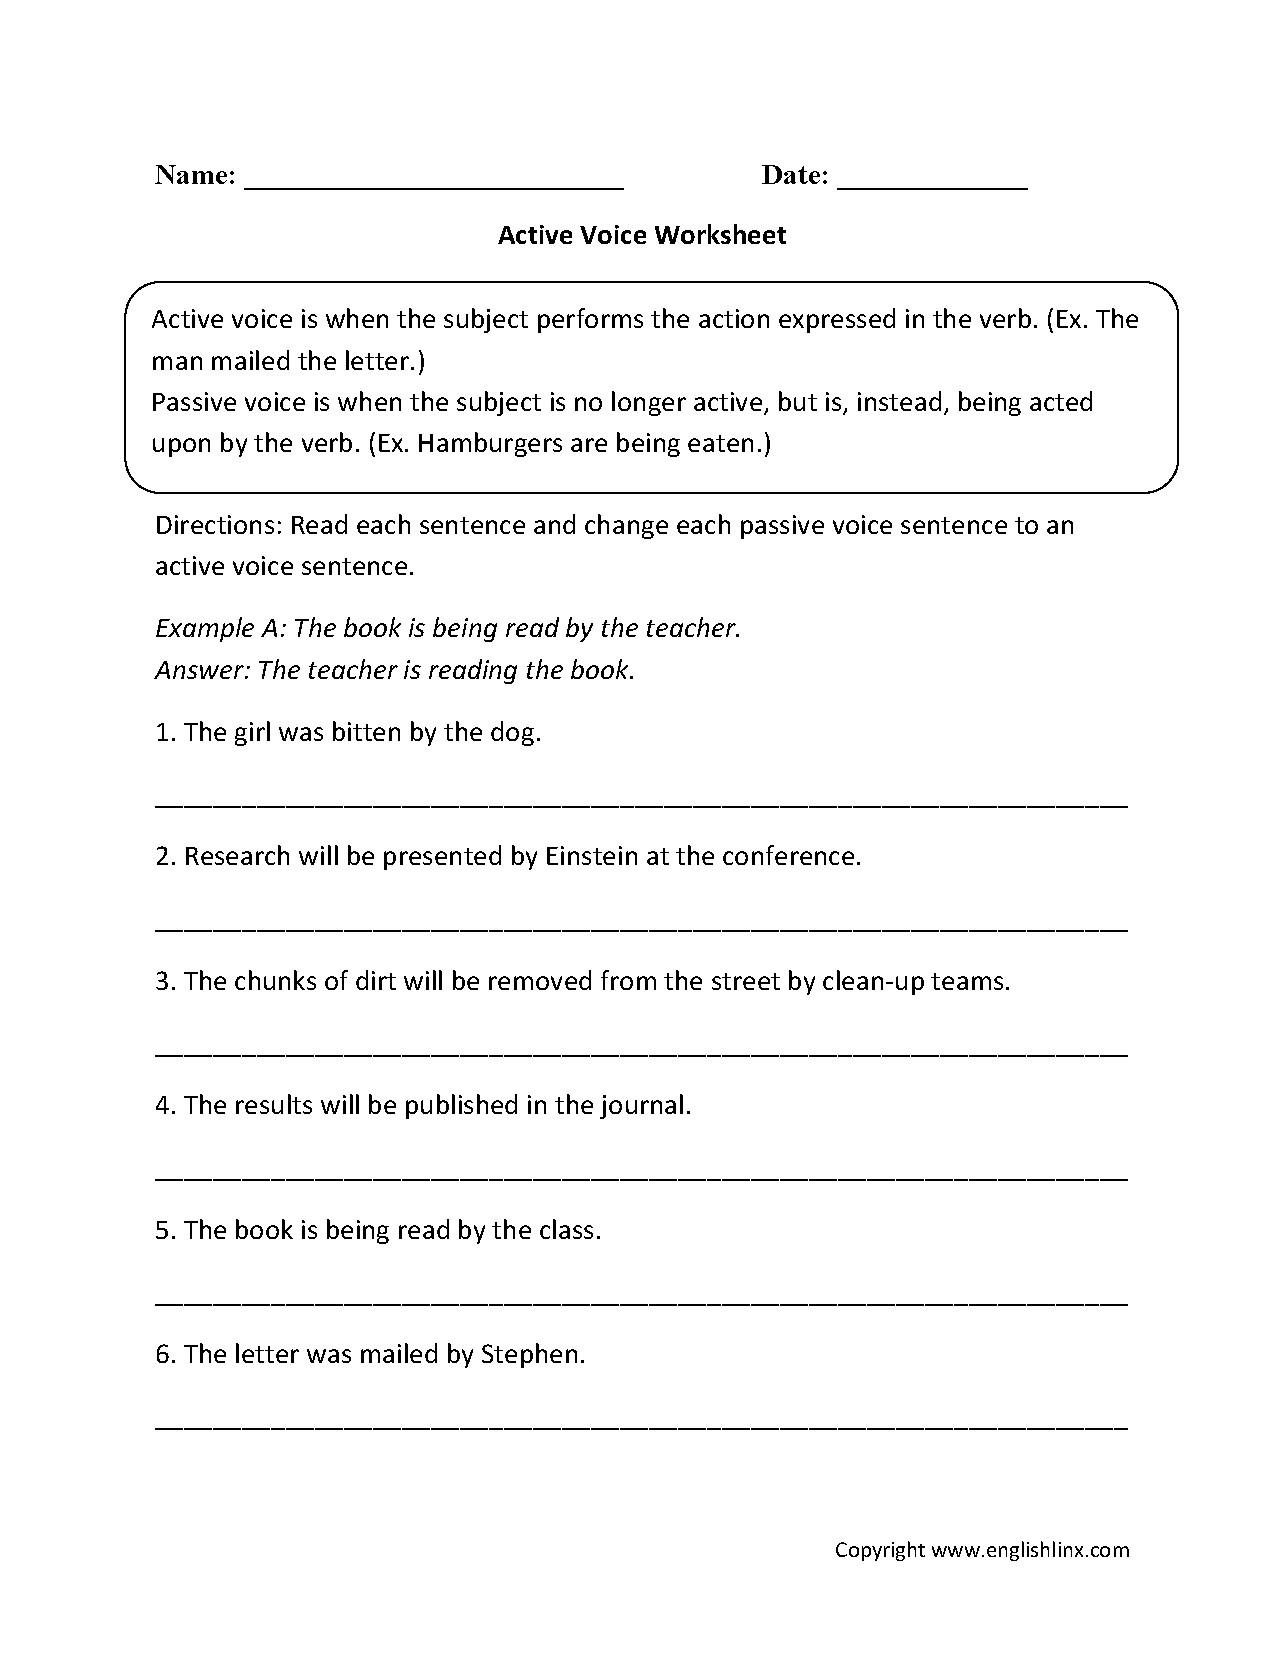 English Worksheets Active Passive Voice Worksheet Resume